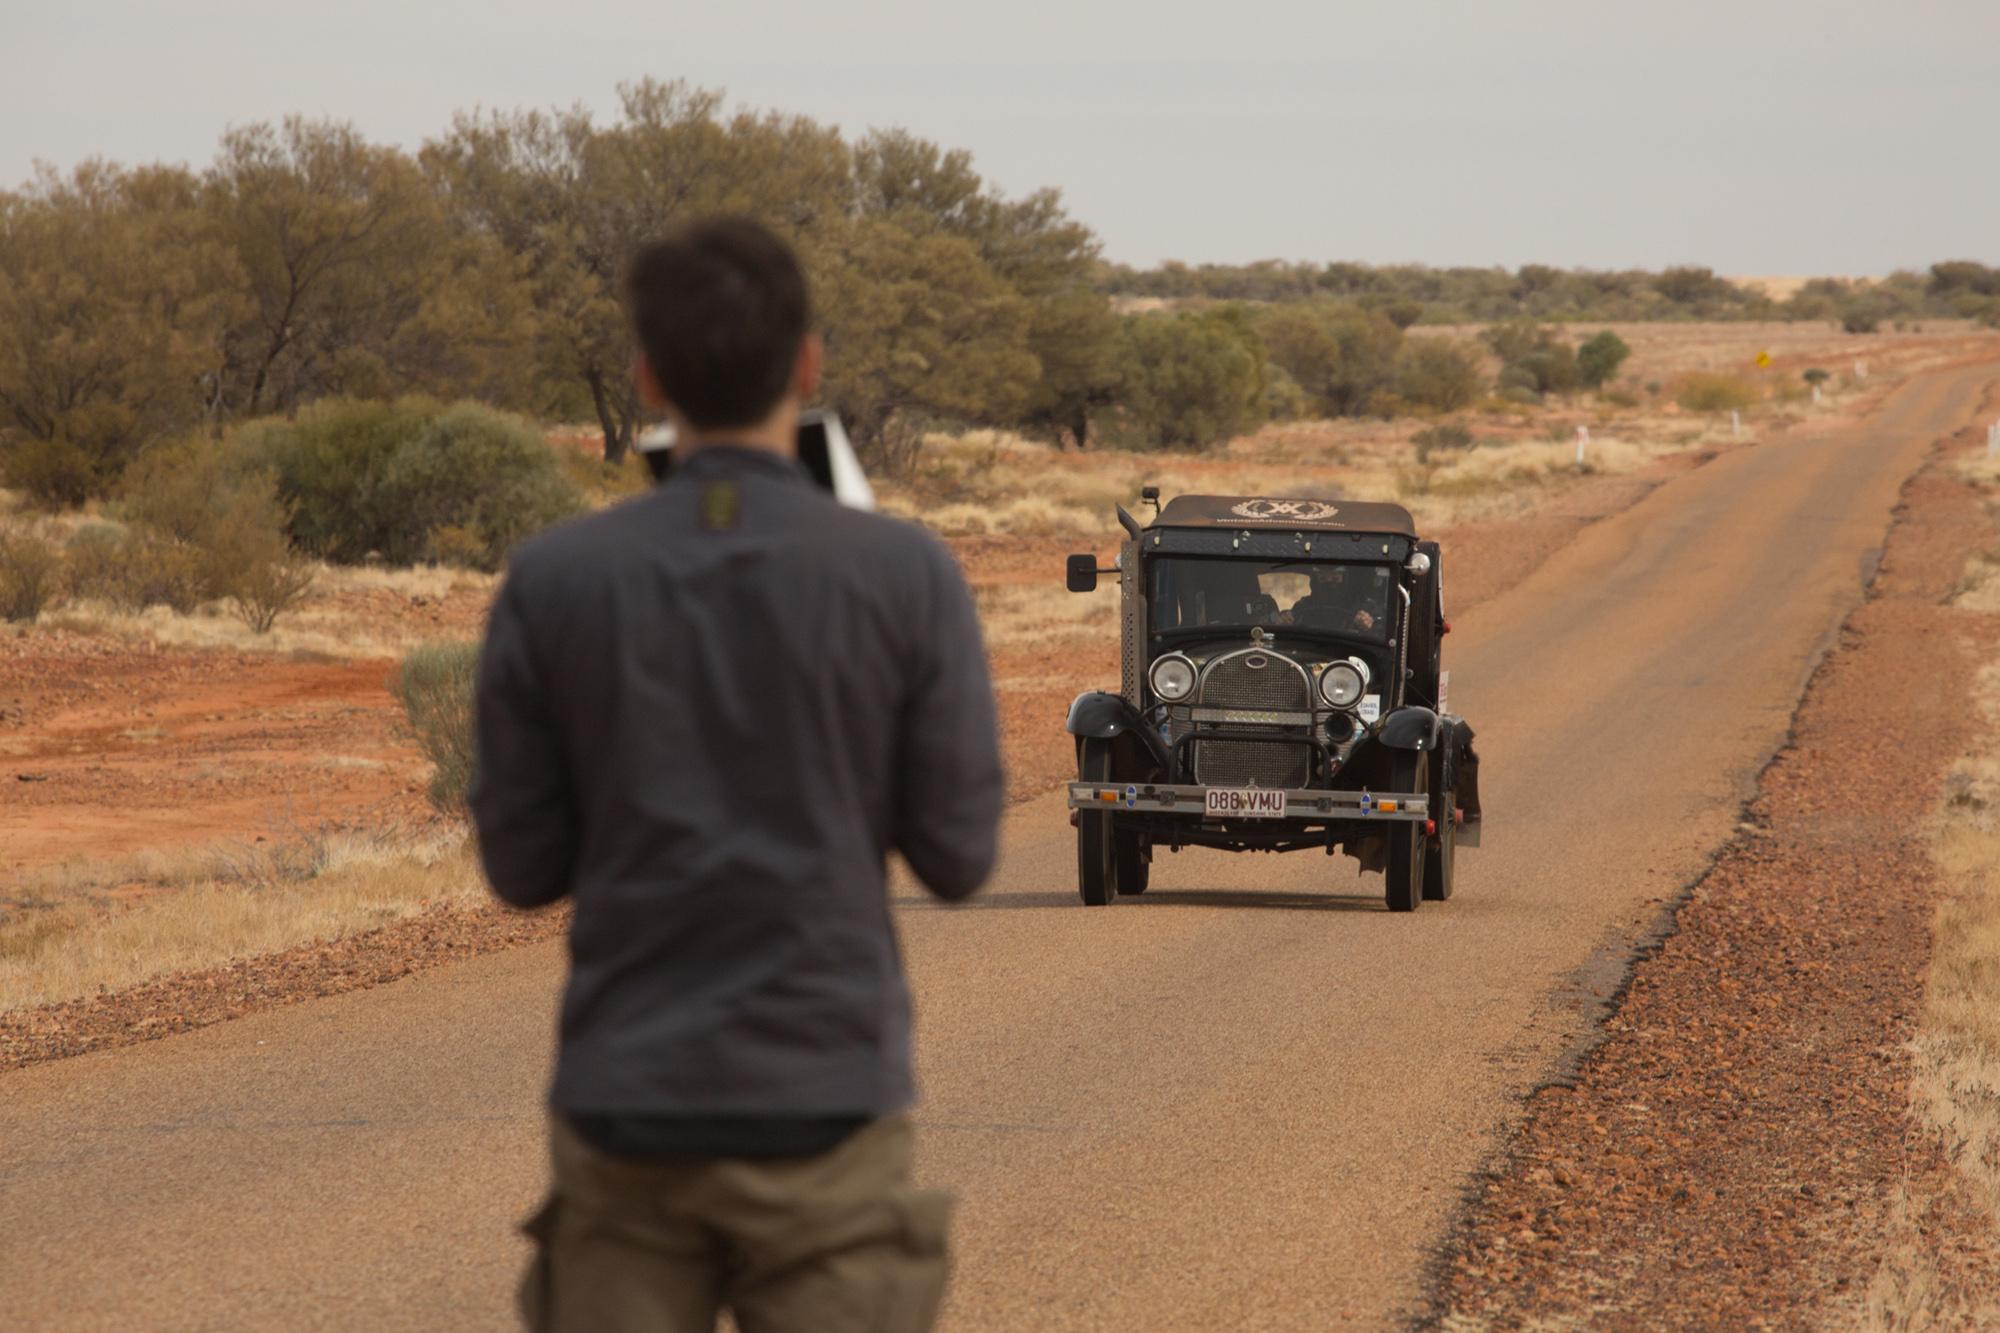 Ben Sherlock filming vehicle on road in Australia